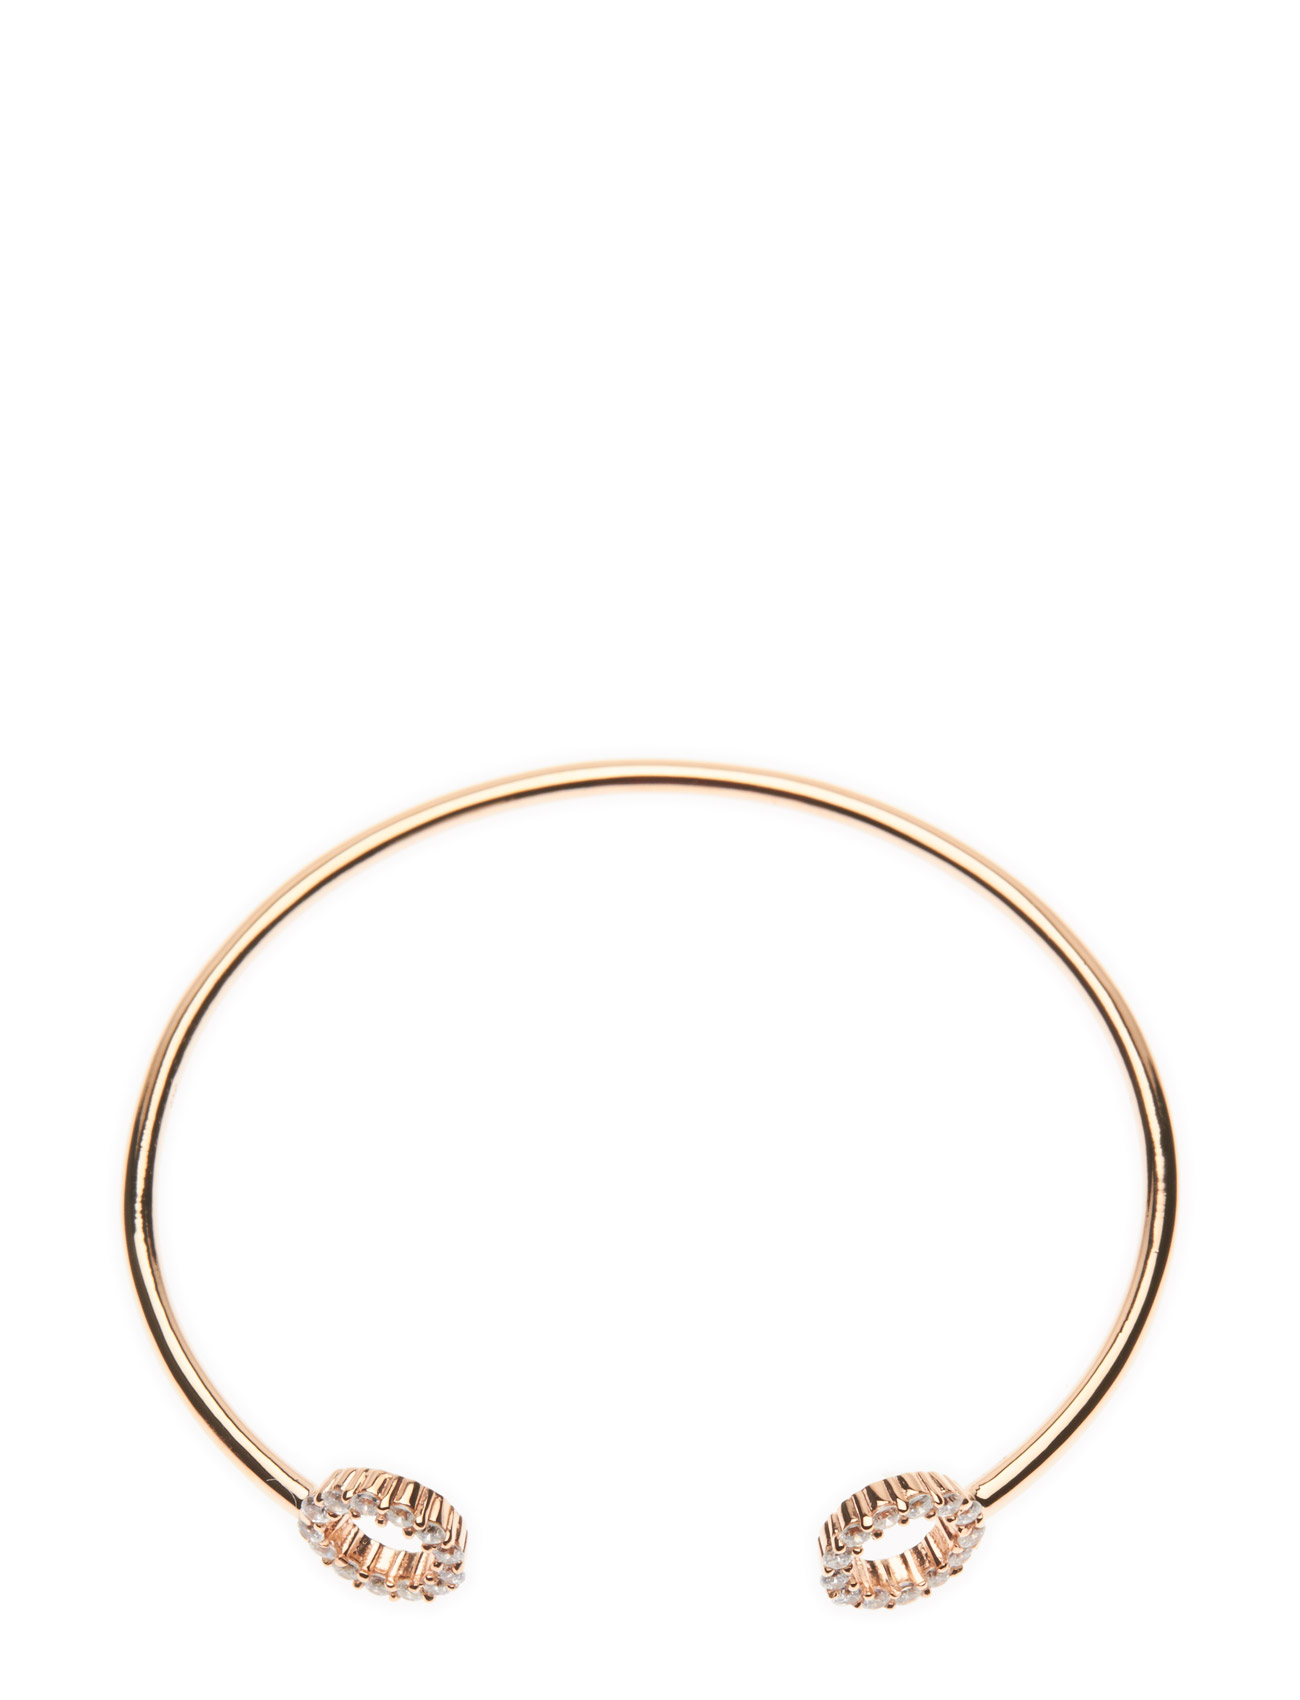 Biella Bangle Large Sif Jakobs Jewellery Accessories til Kvinder i Guld